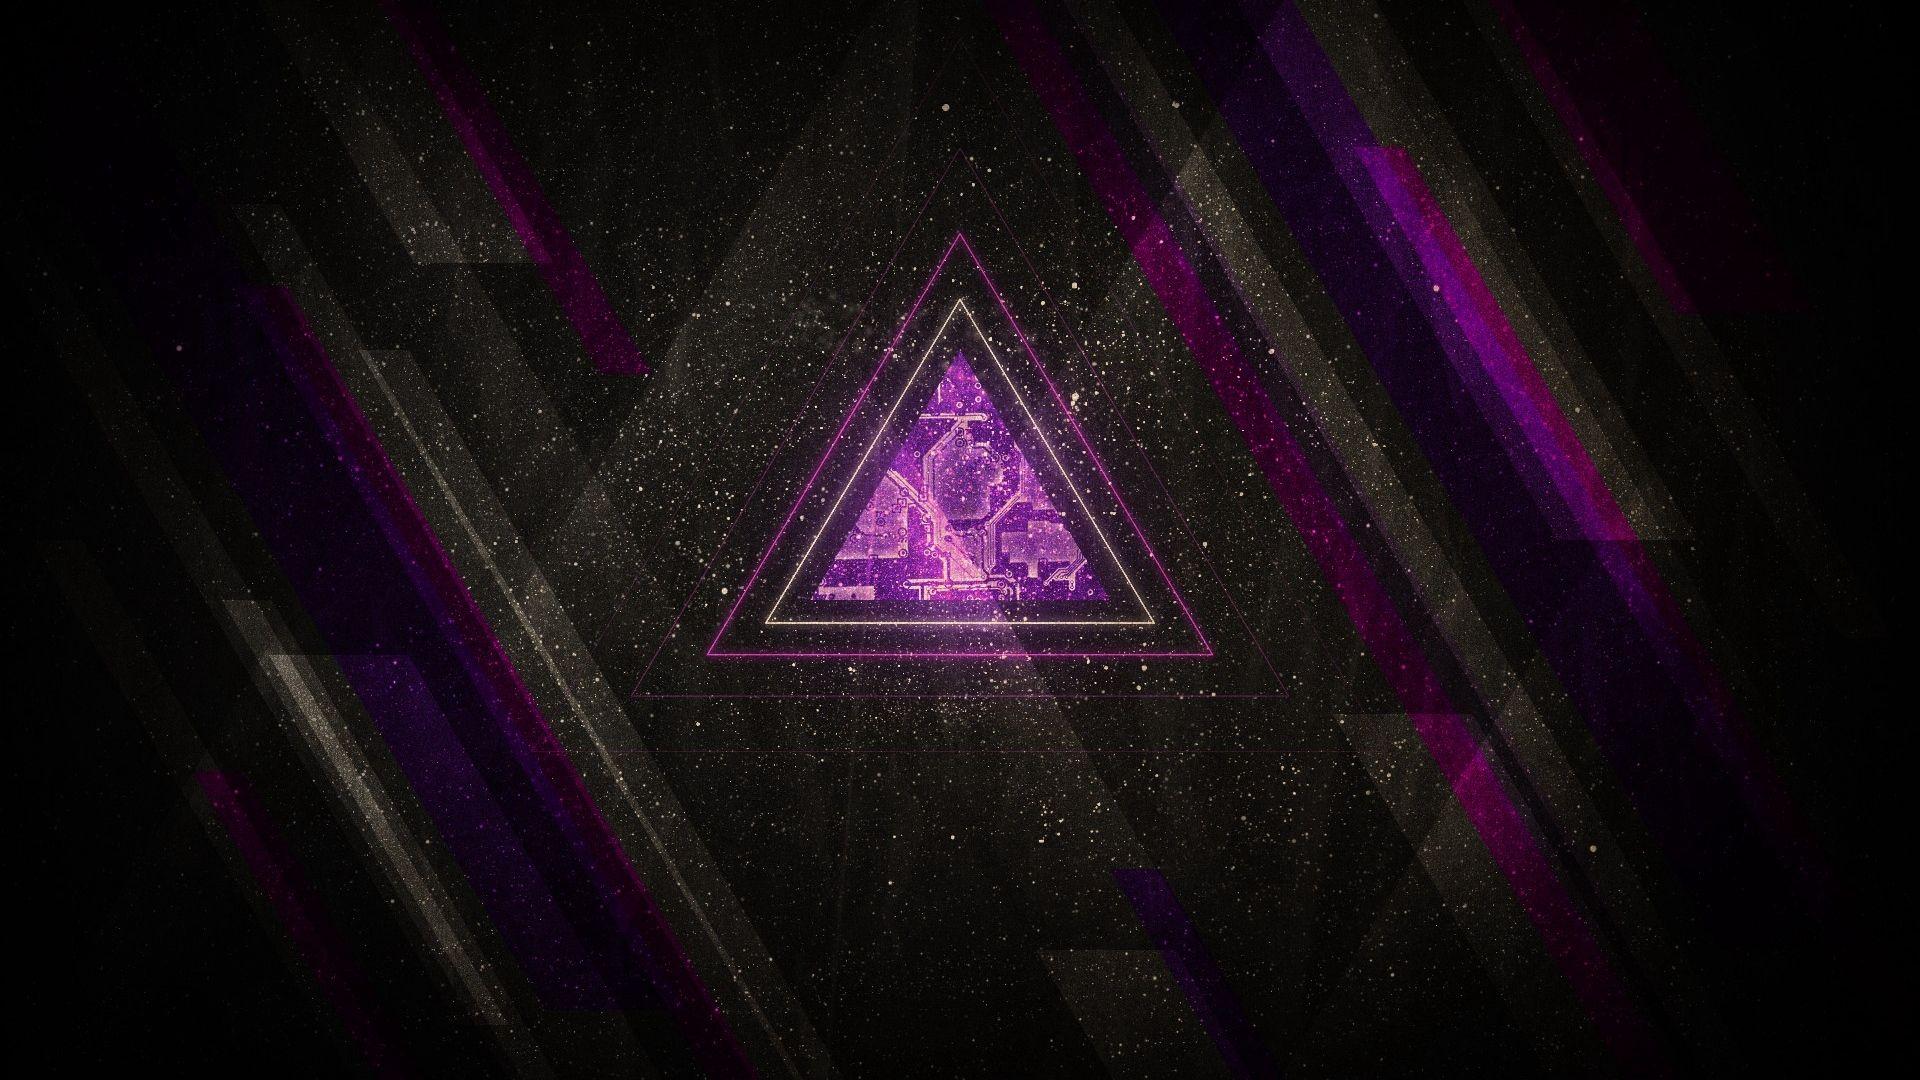 Triangle Pic